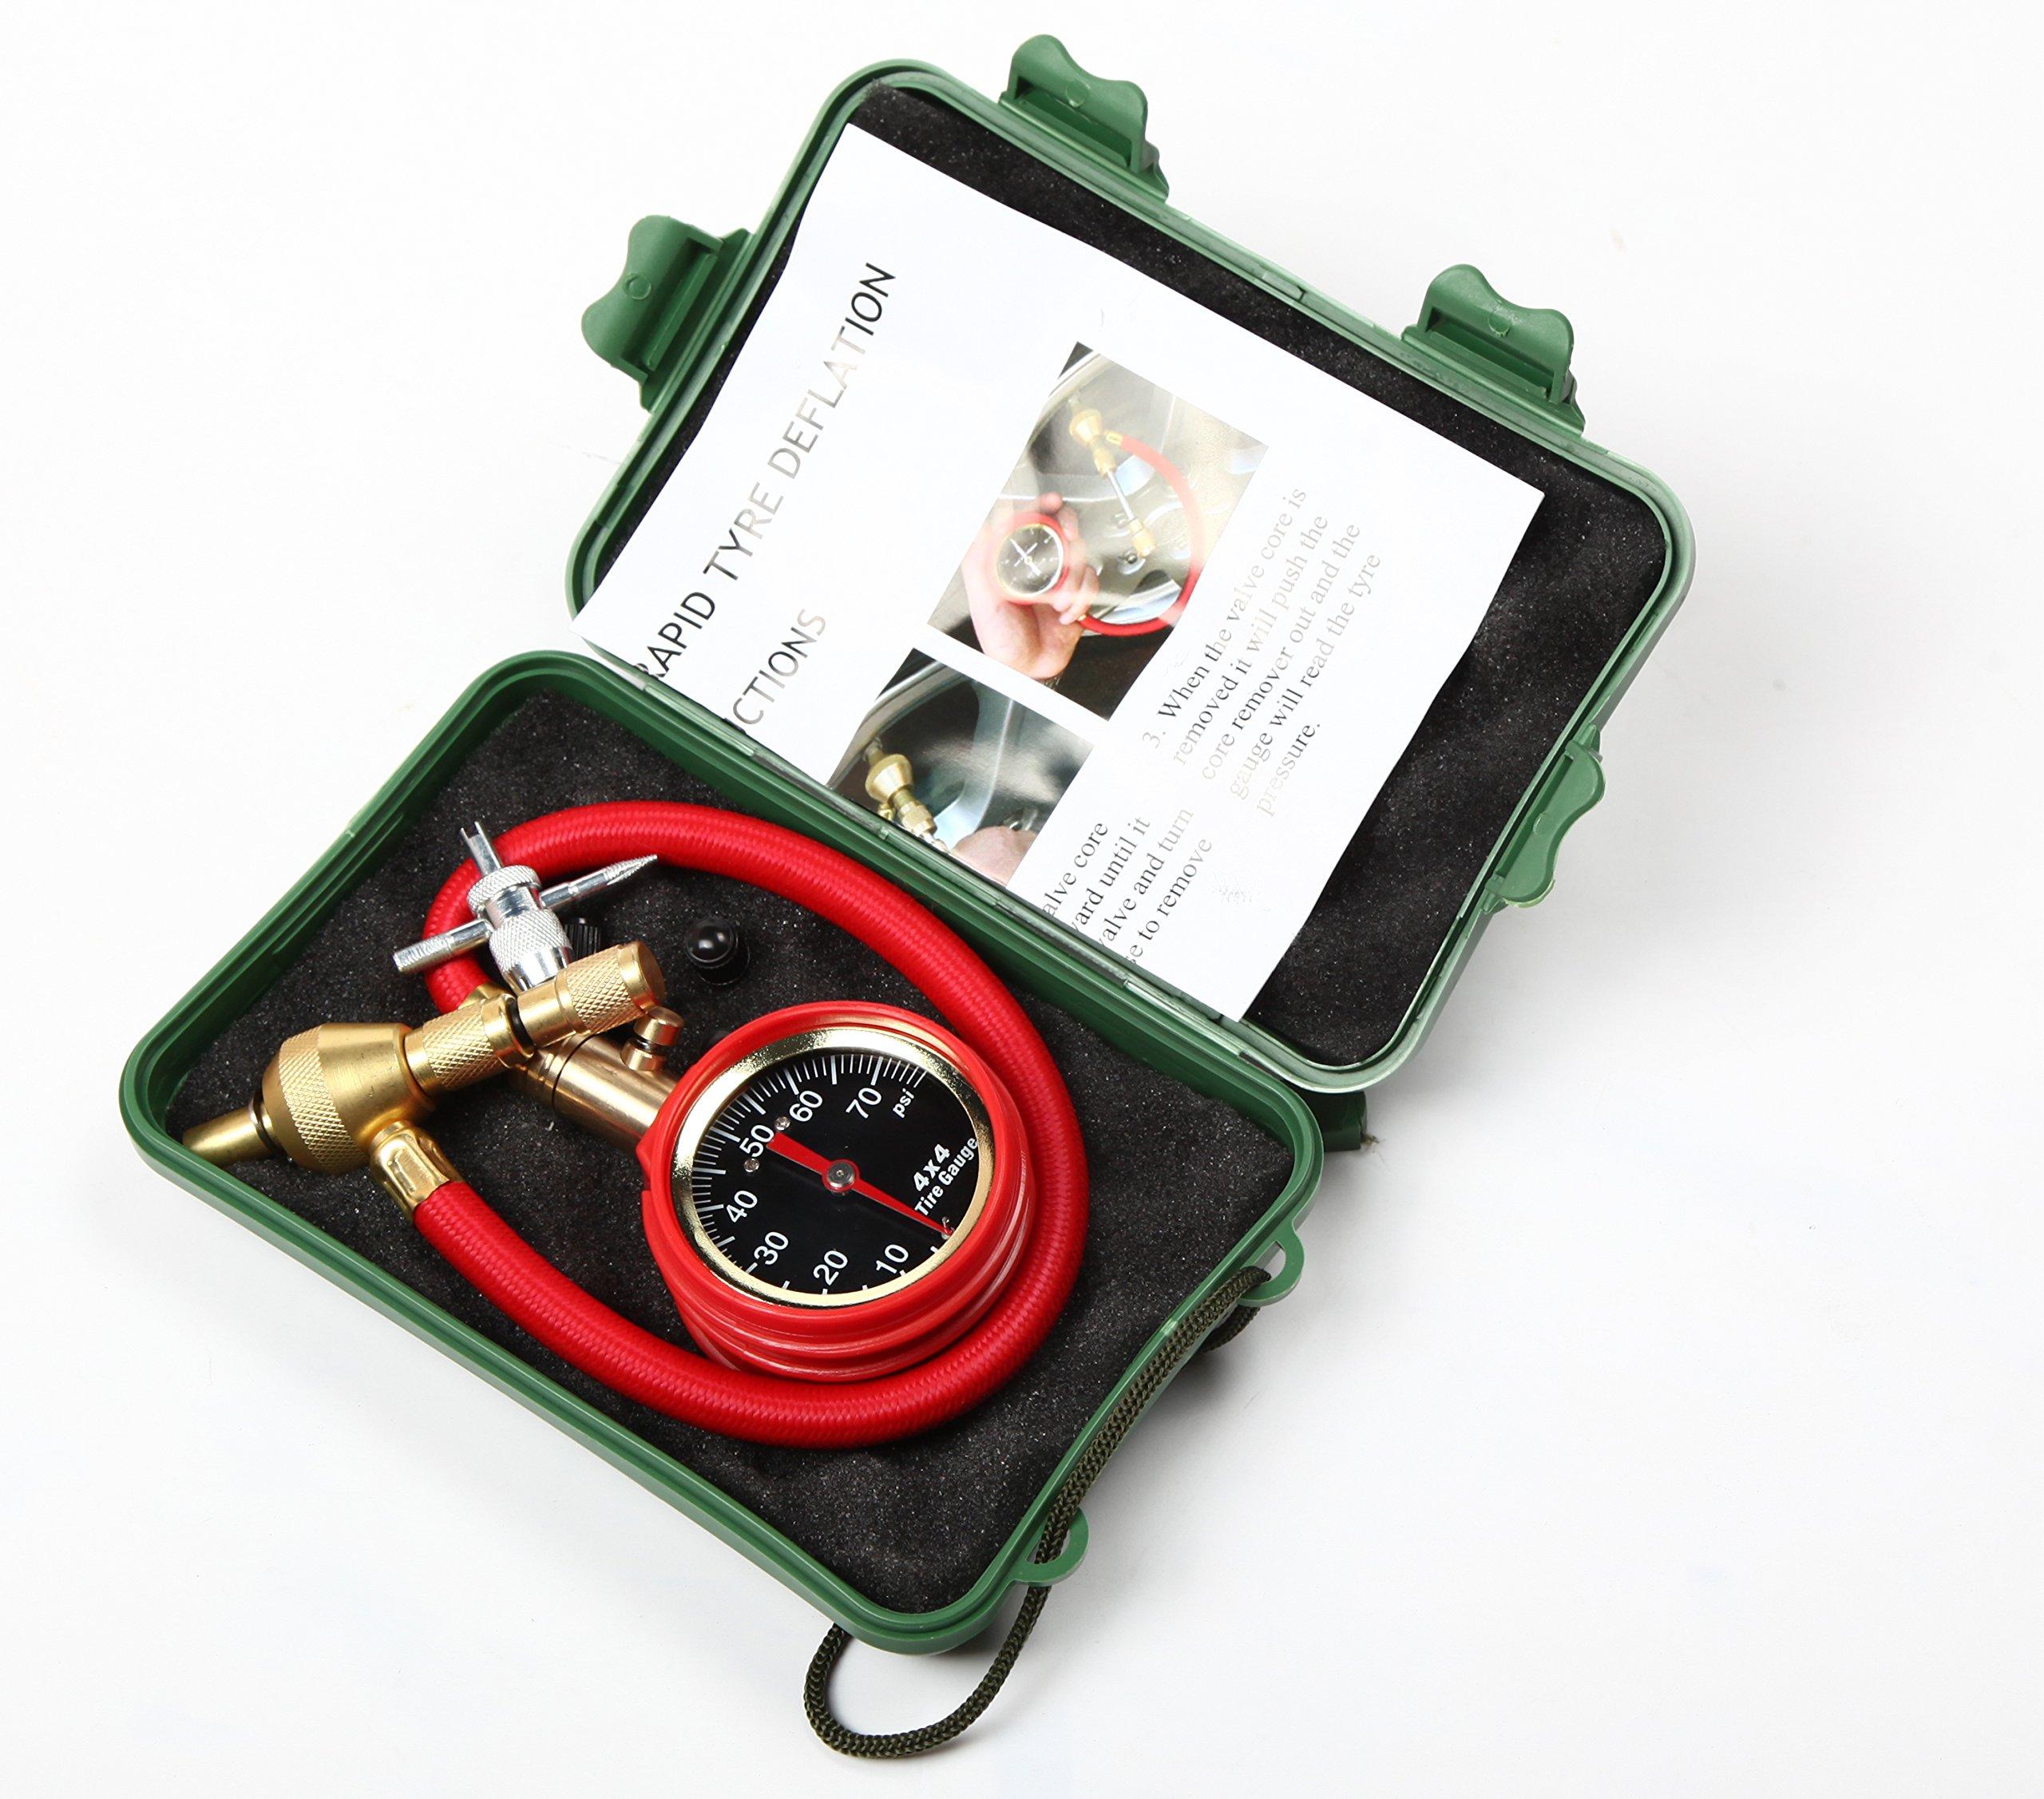 OFFROAD BOAR Adjustable Automatic Tire Deflators Kit